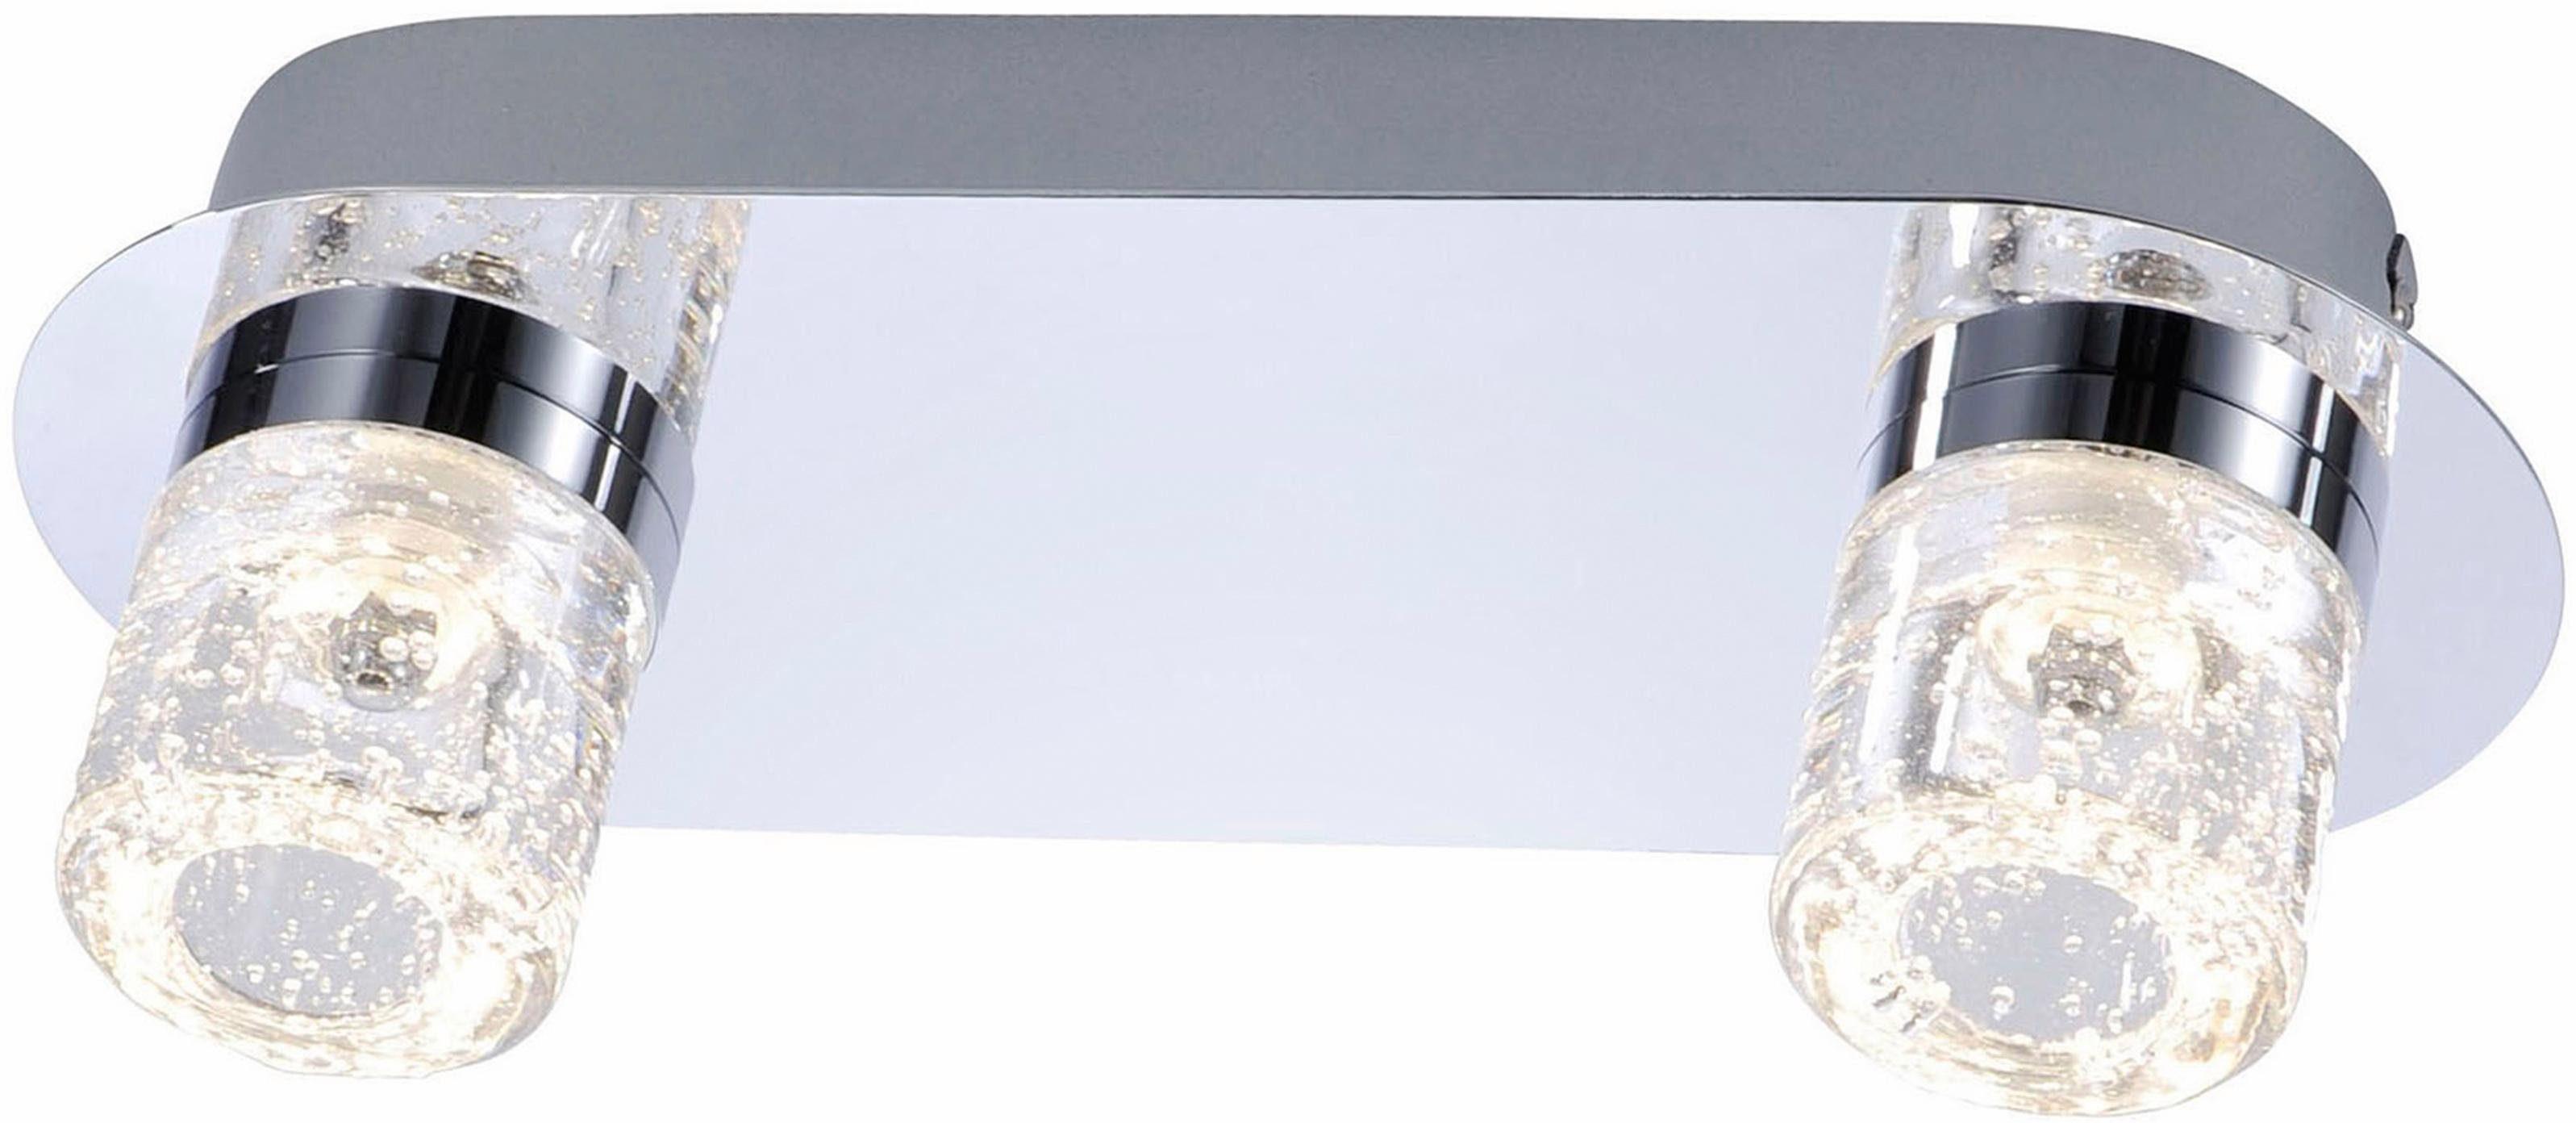 Paul Neuhaus LED Deckenleuchte »BILAN«